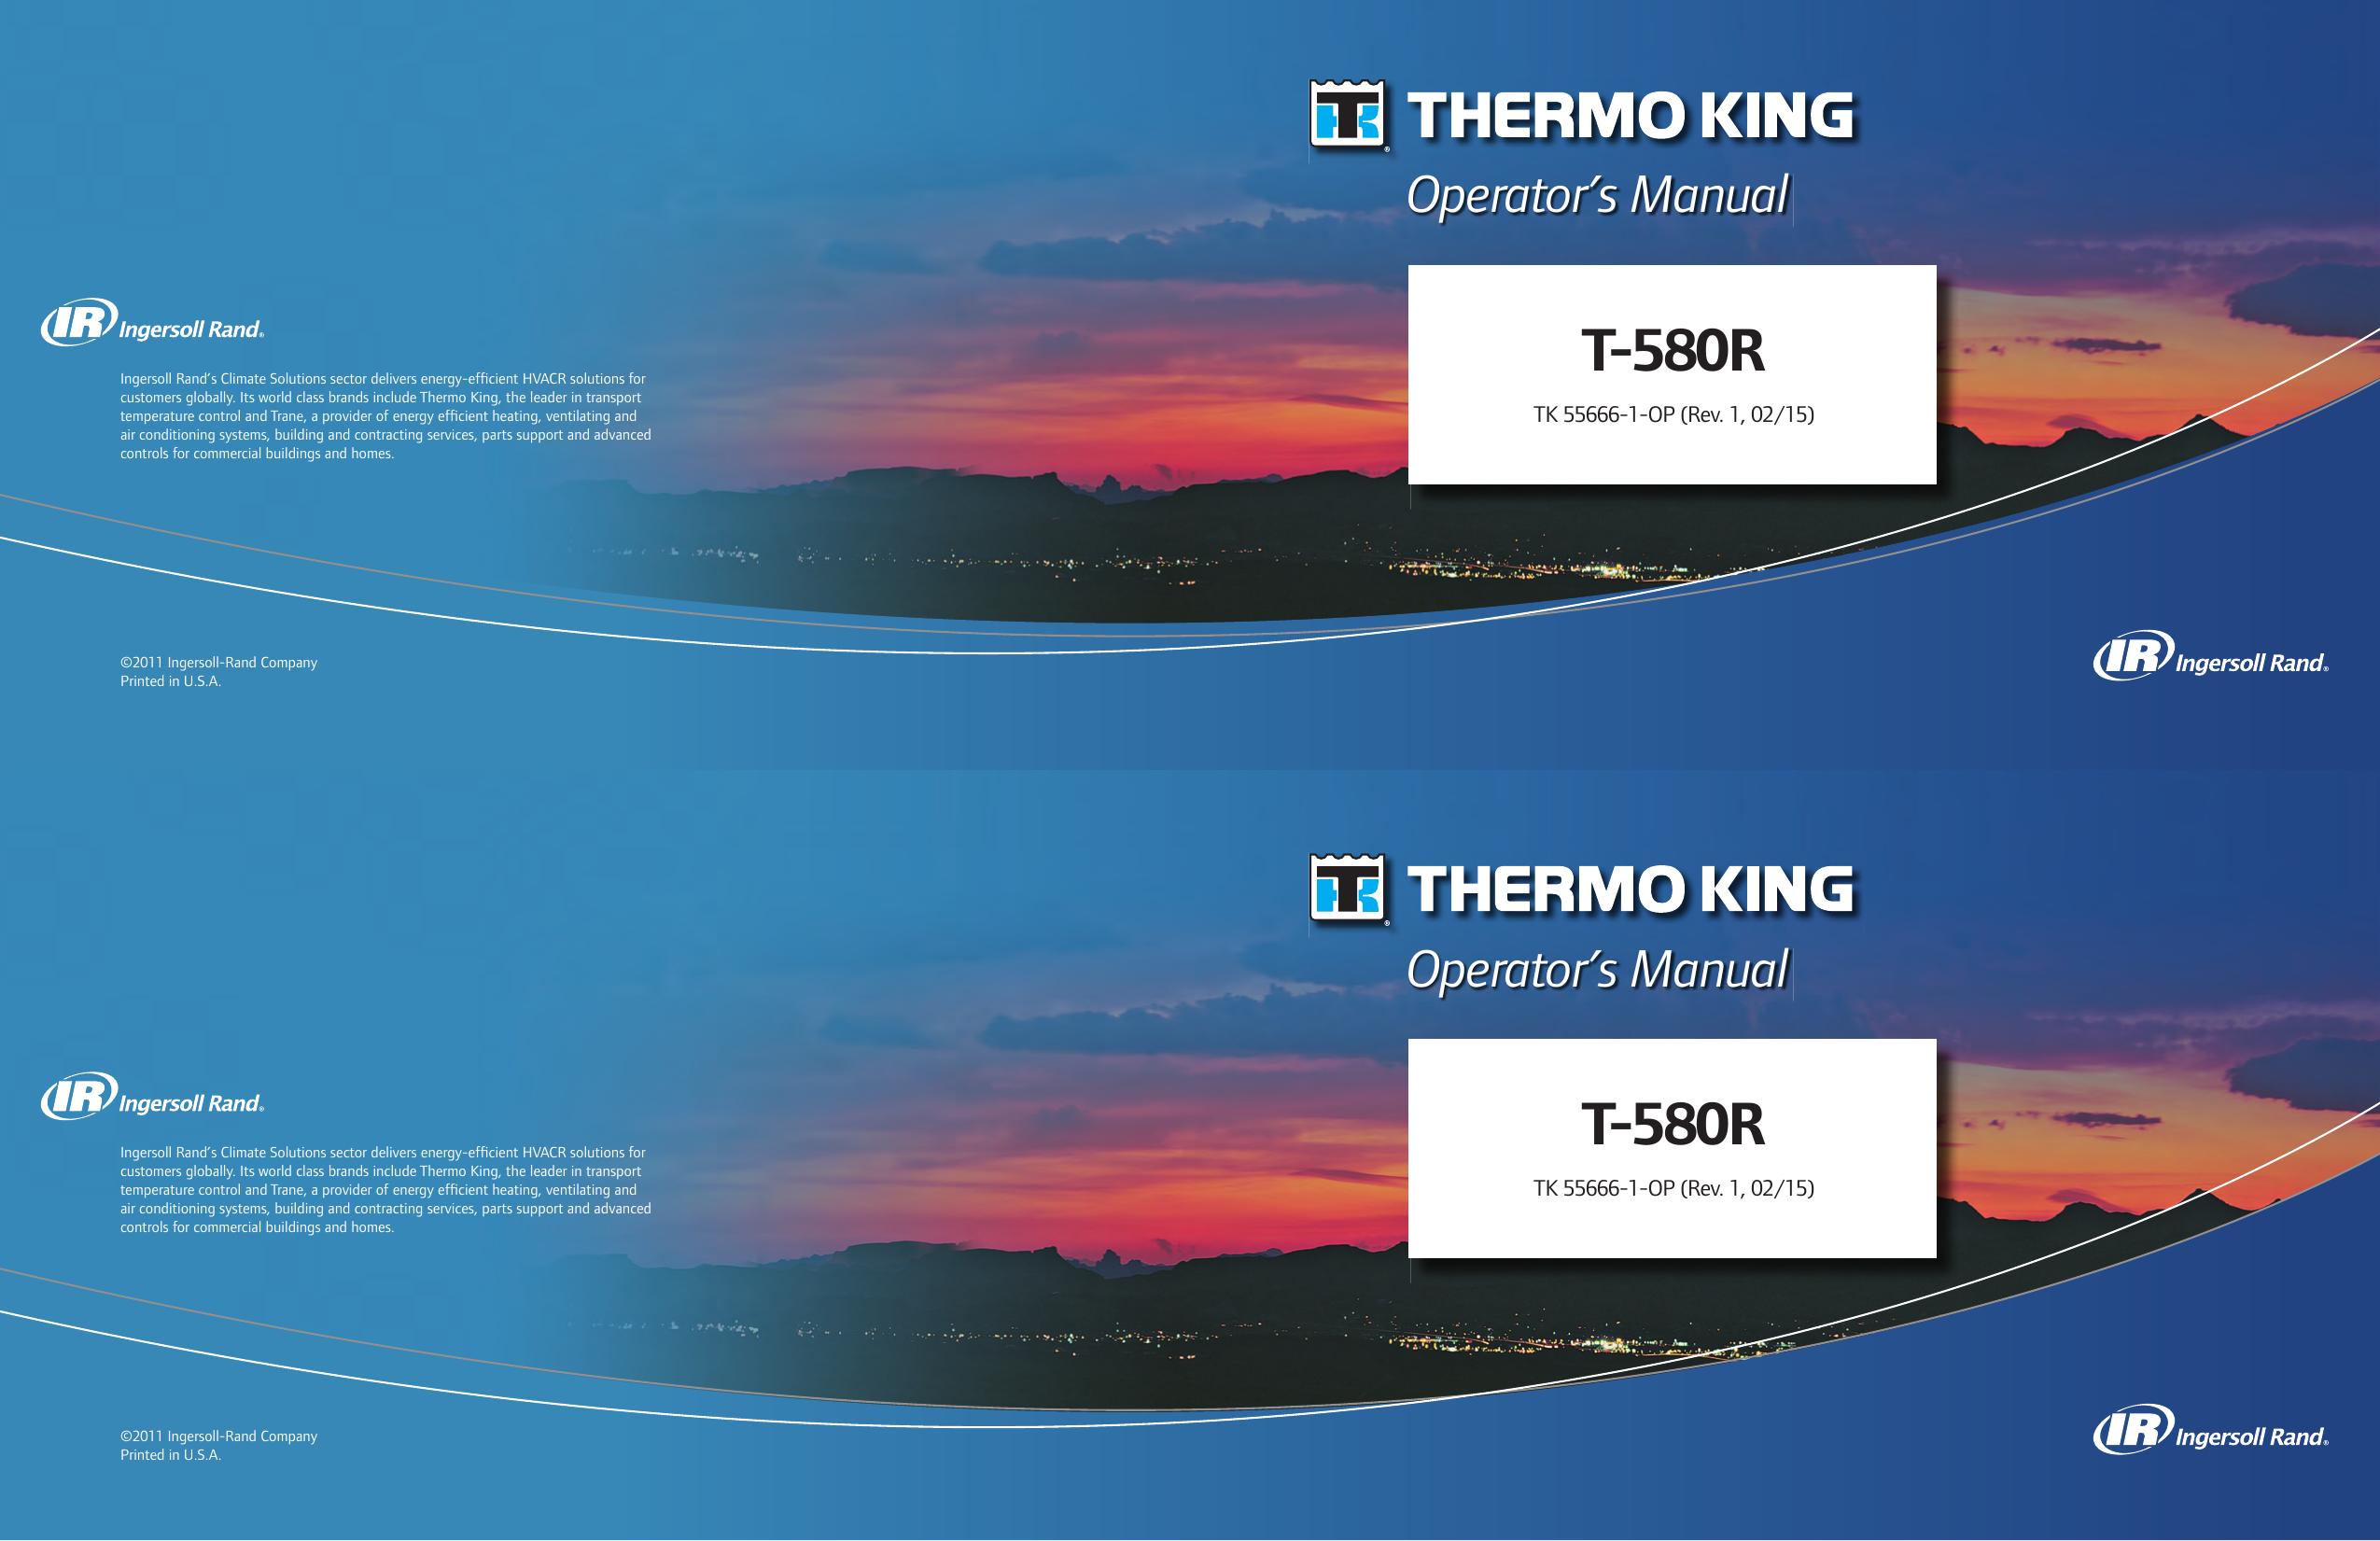 T-580R - Thermo King | manualzz com